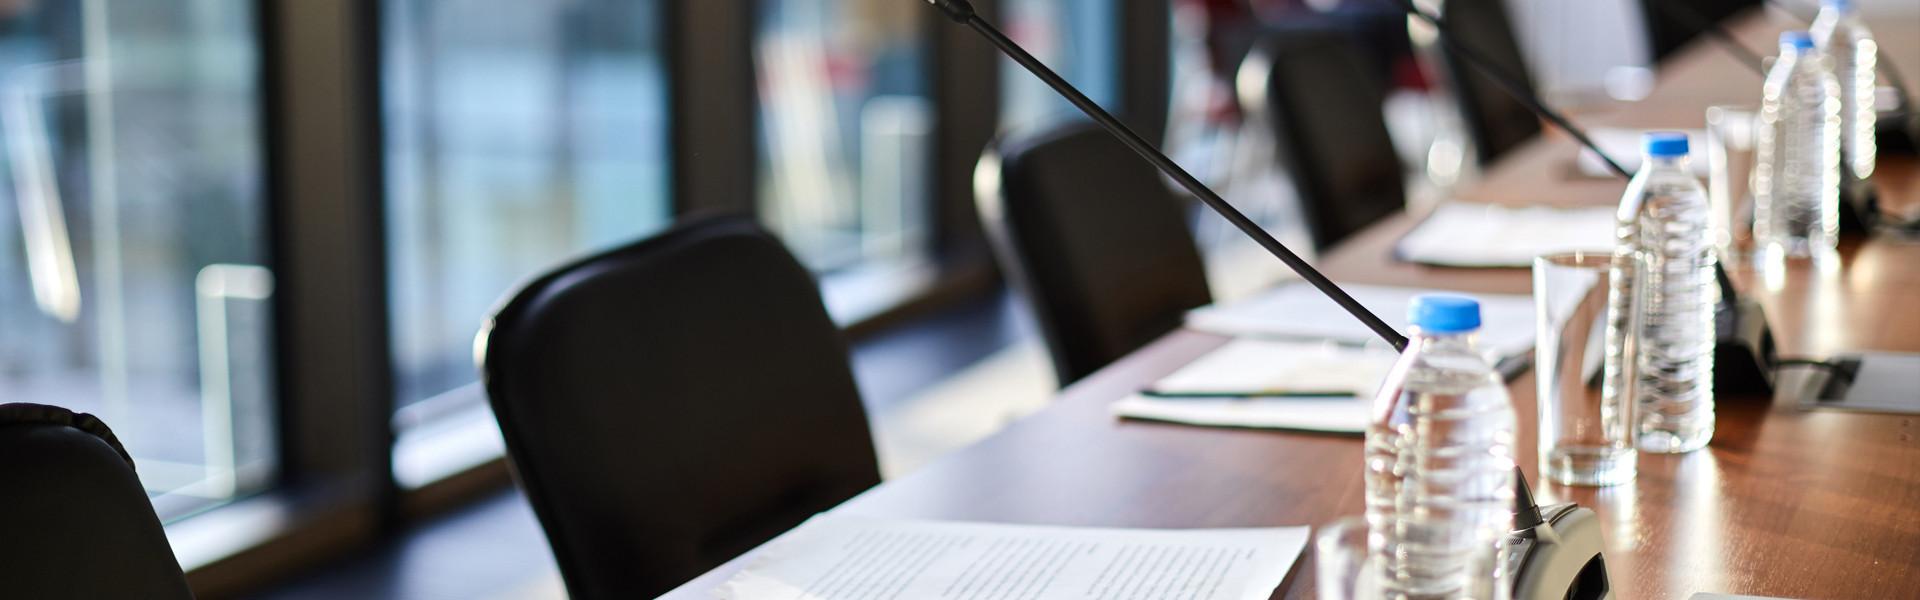 Association Meeting Hotel Deals In Park City - Park City Association Meeting